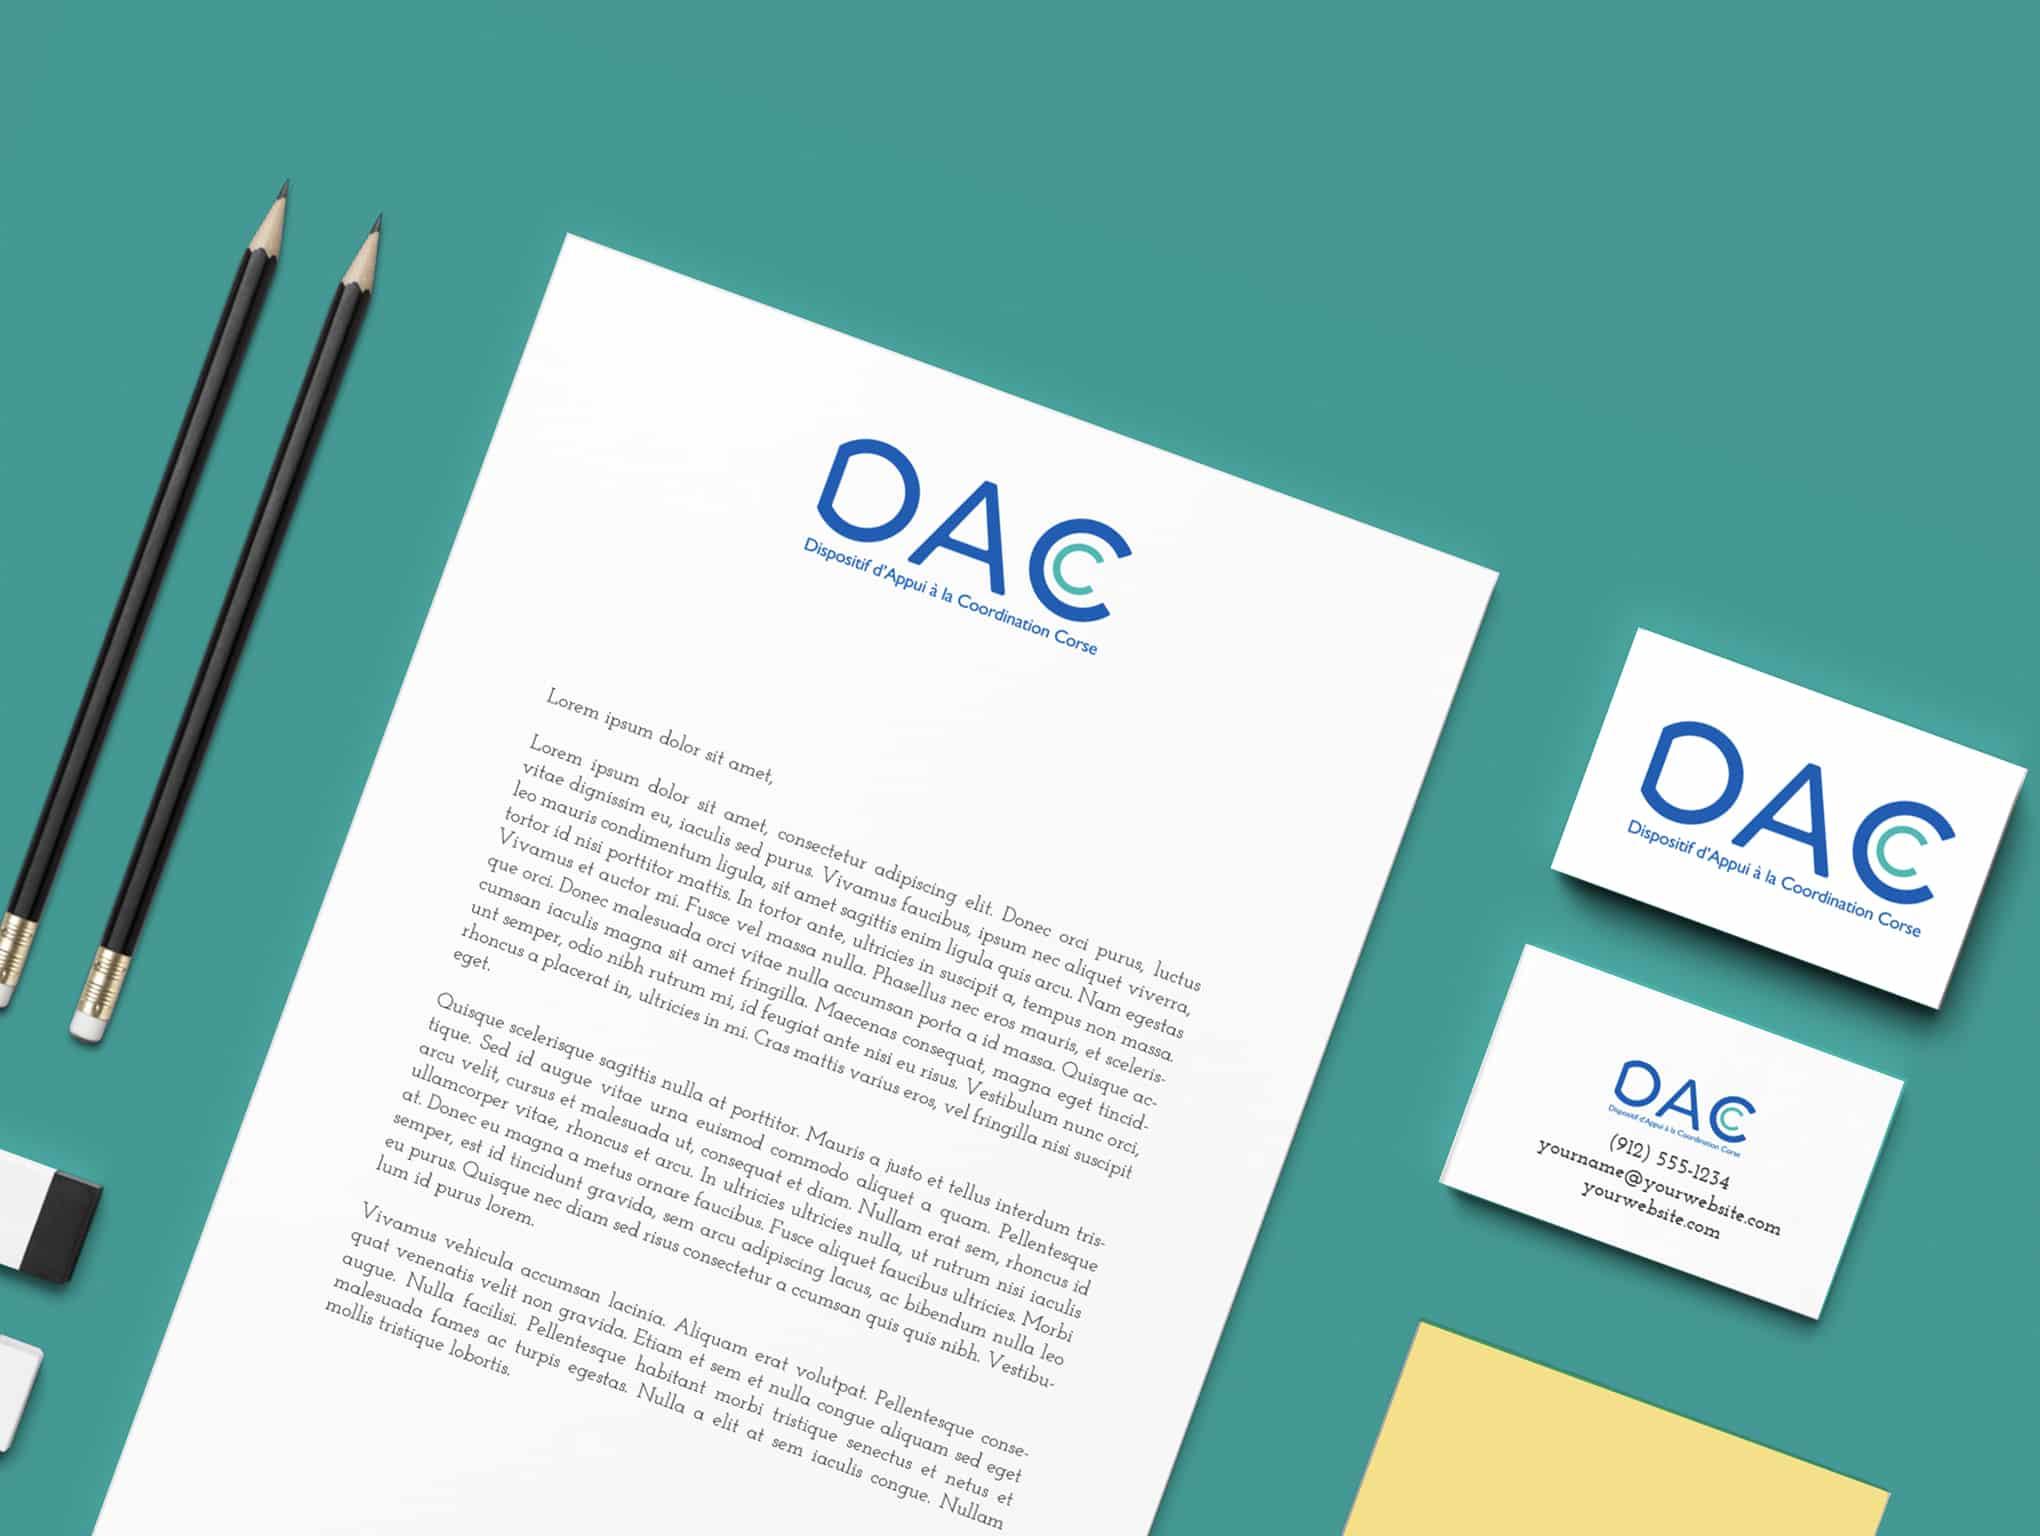 DAC-logo-mockup-qui-2bouge